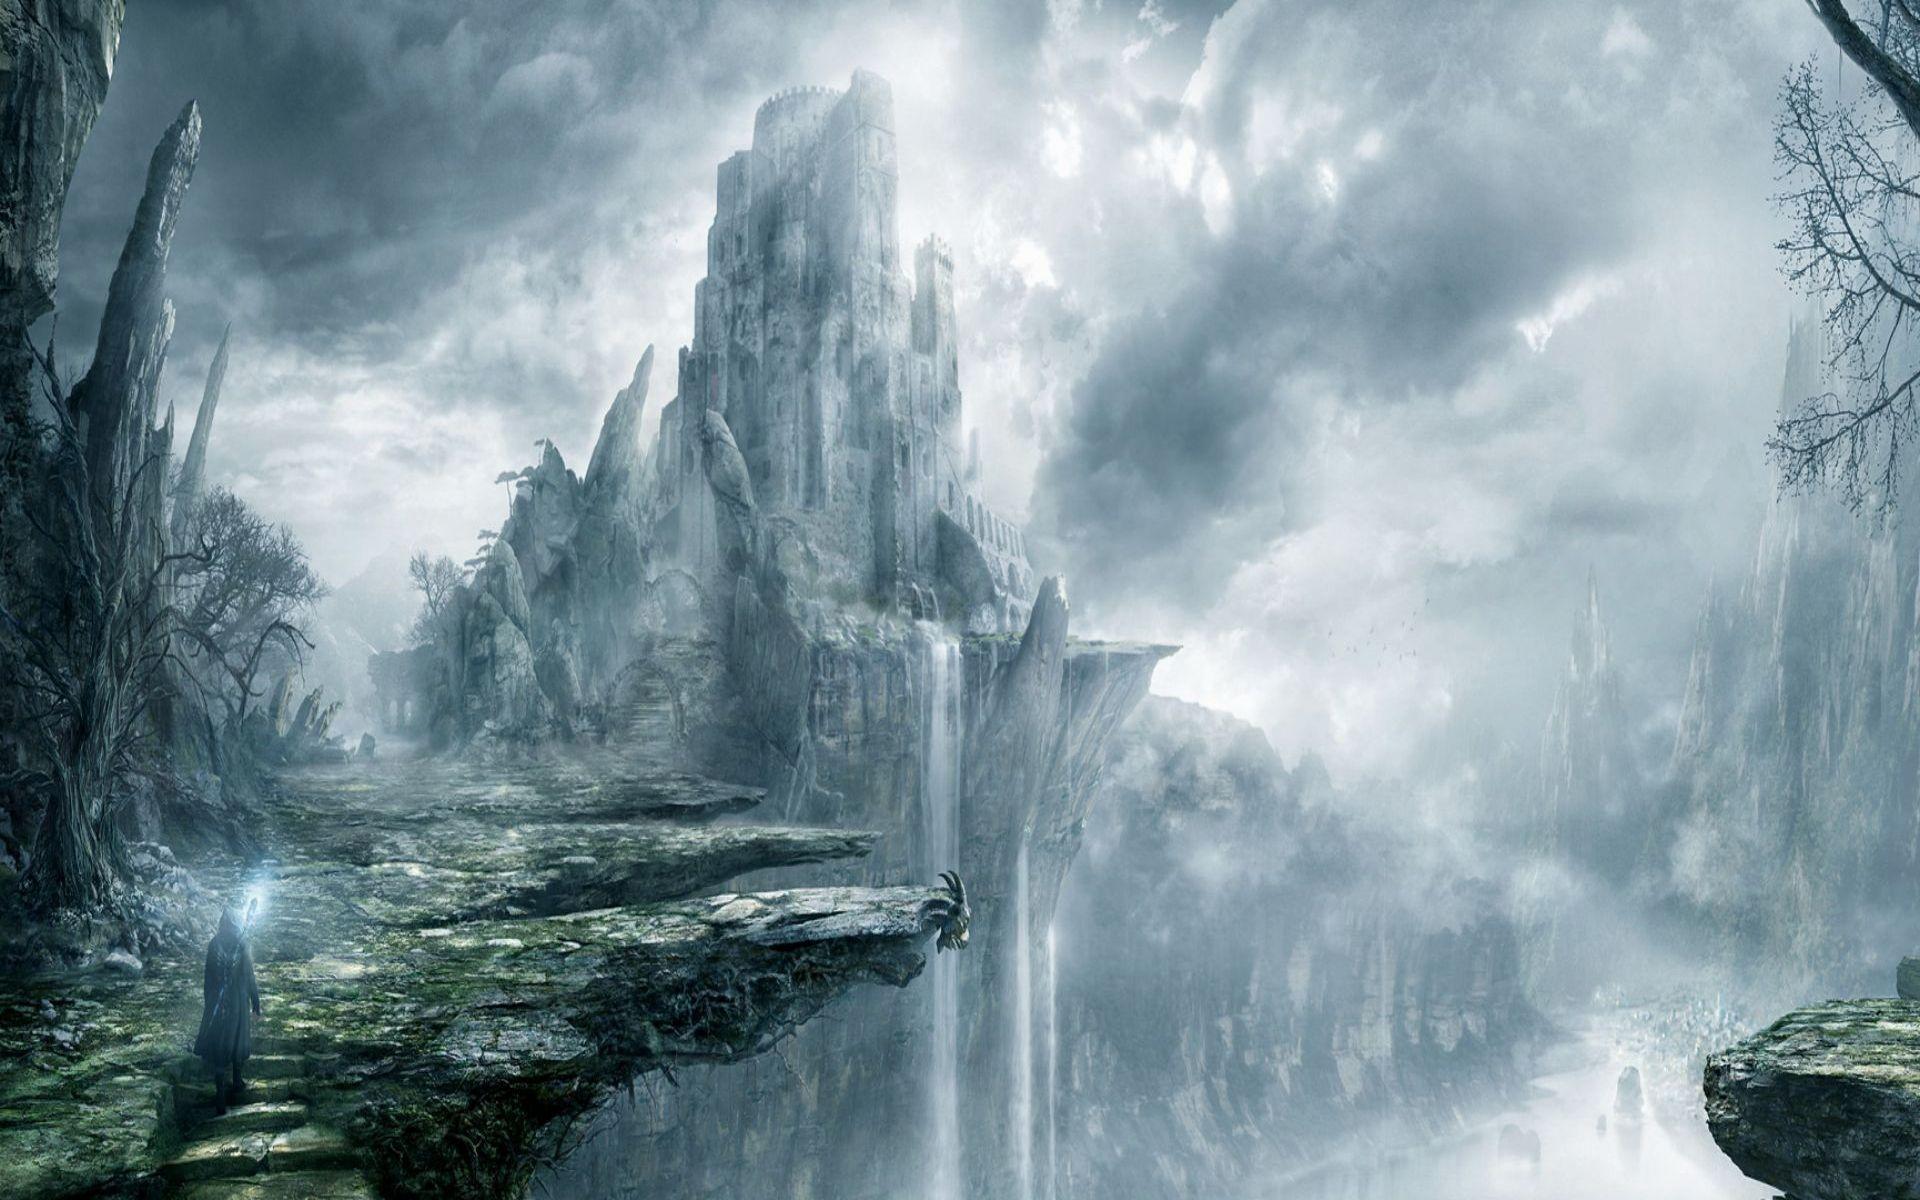 Epic-Fantasy-1080p-wallpaper-wp4006038